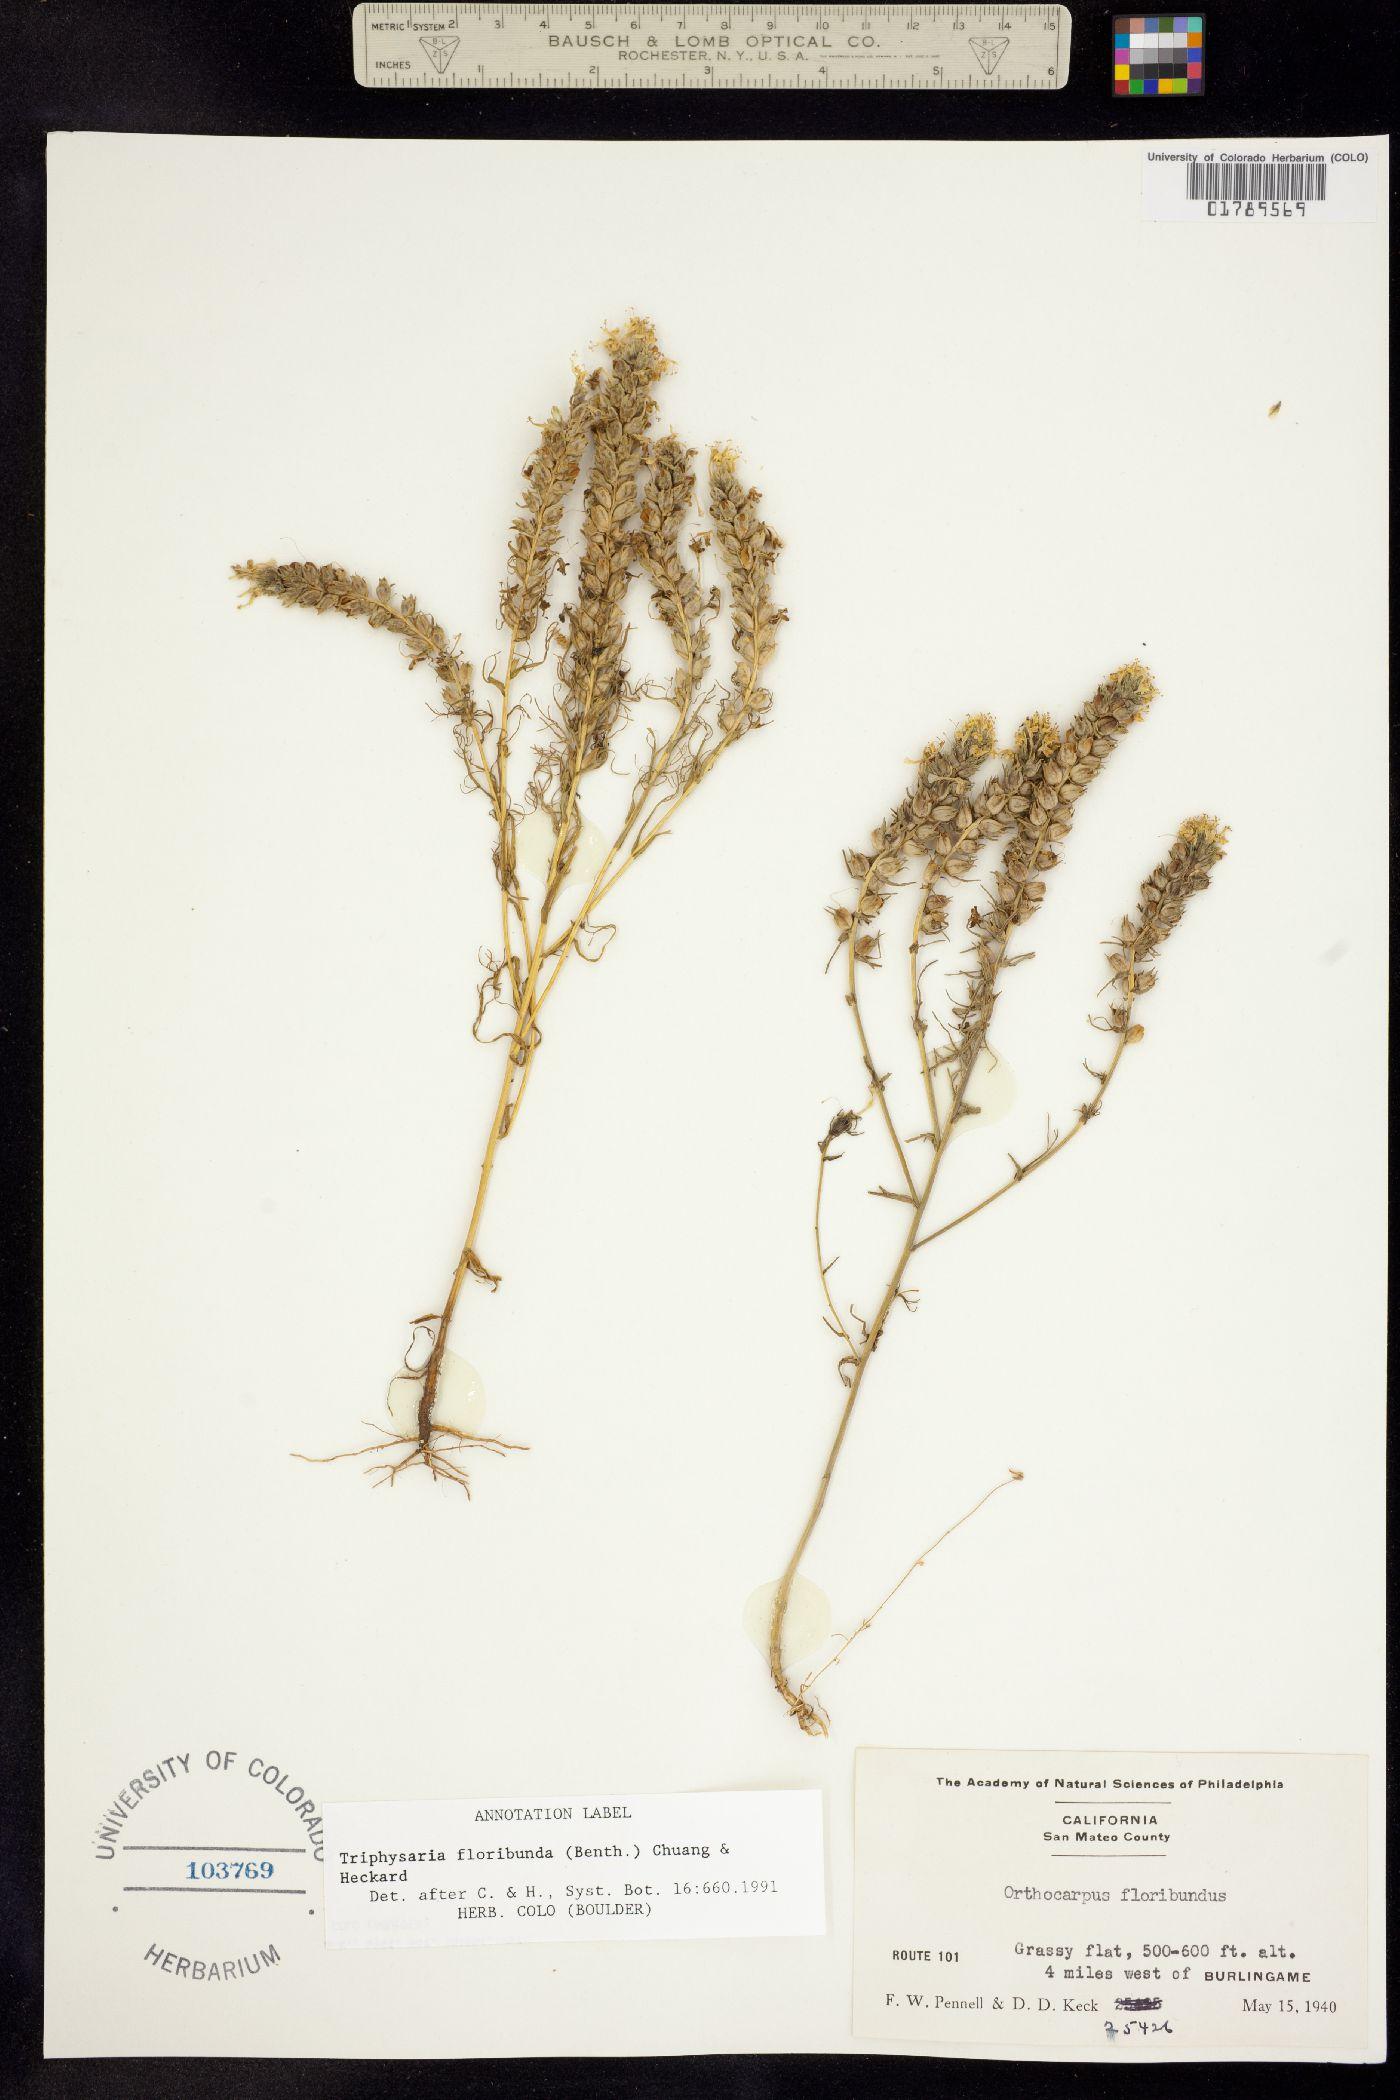 Triphysaria floribunda image